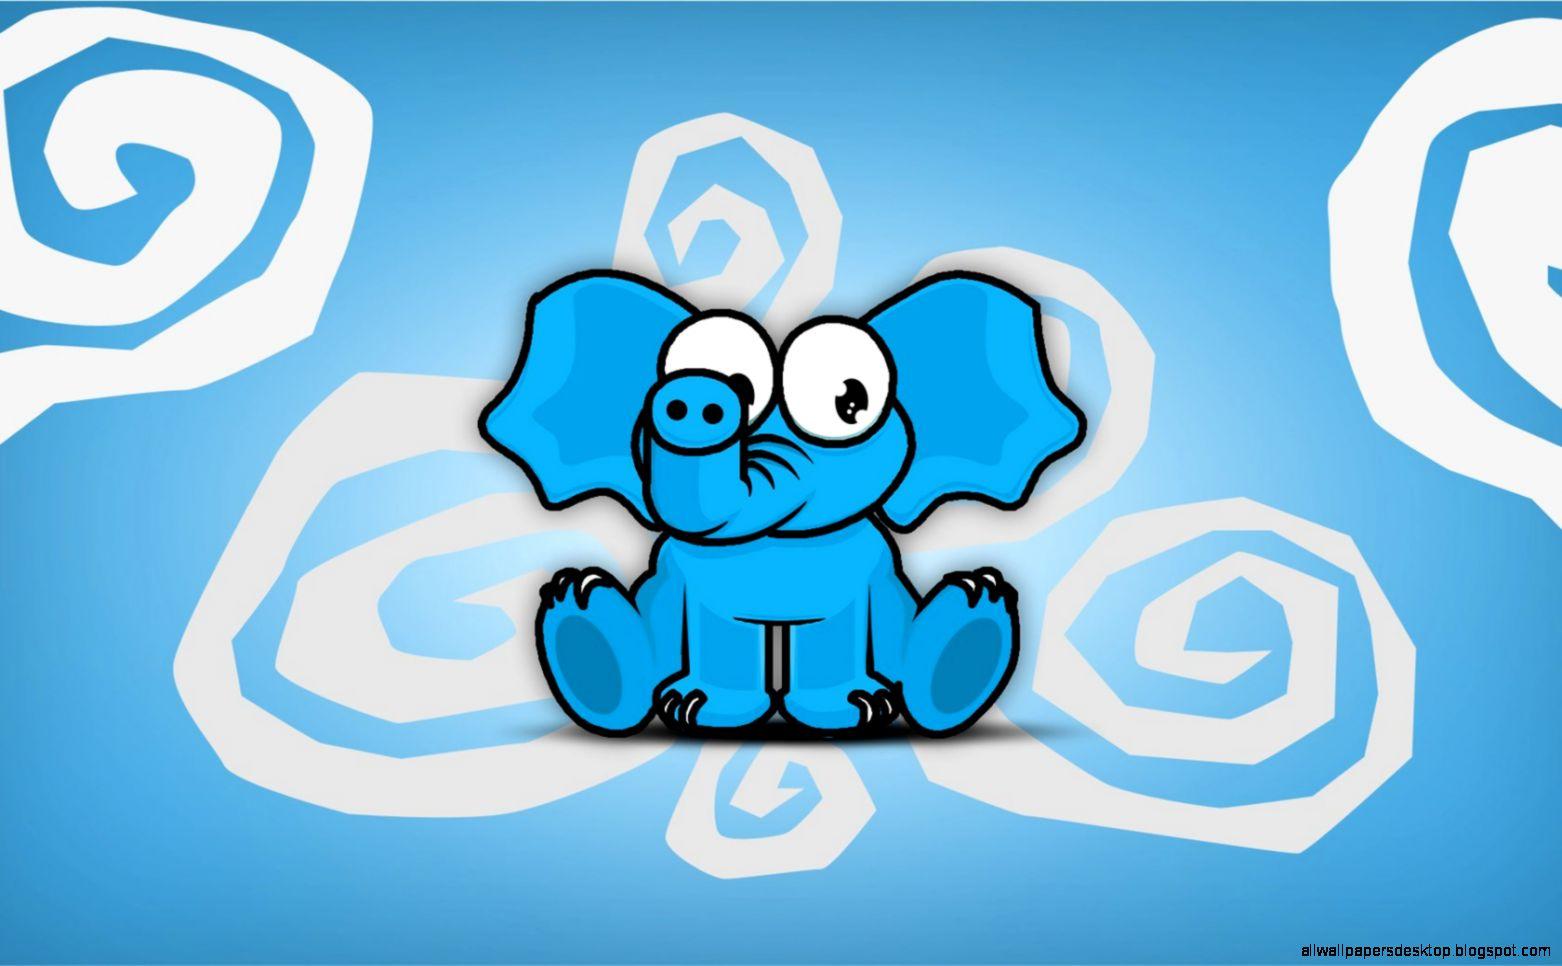 Download Wallpaper Cartoon Elephant - elephant-blue-cartoon-wallpaper-1680x1050-9226  Picture_503425  .jpg